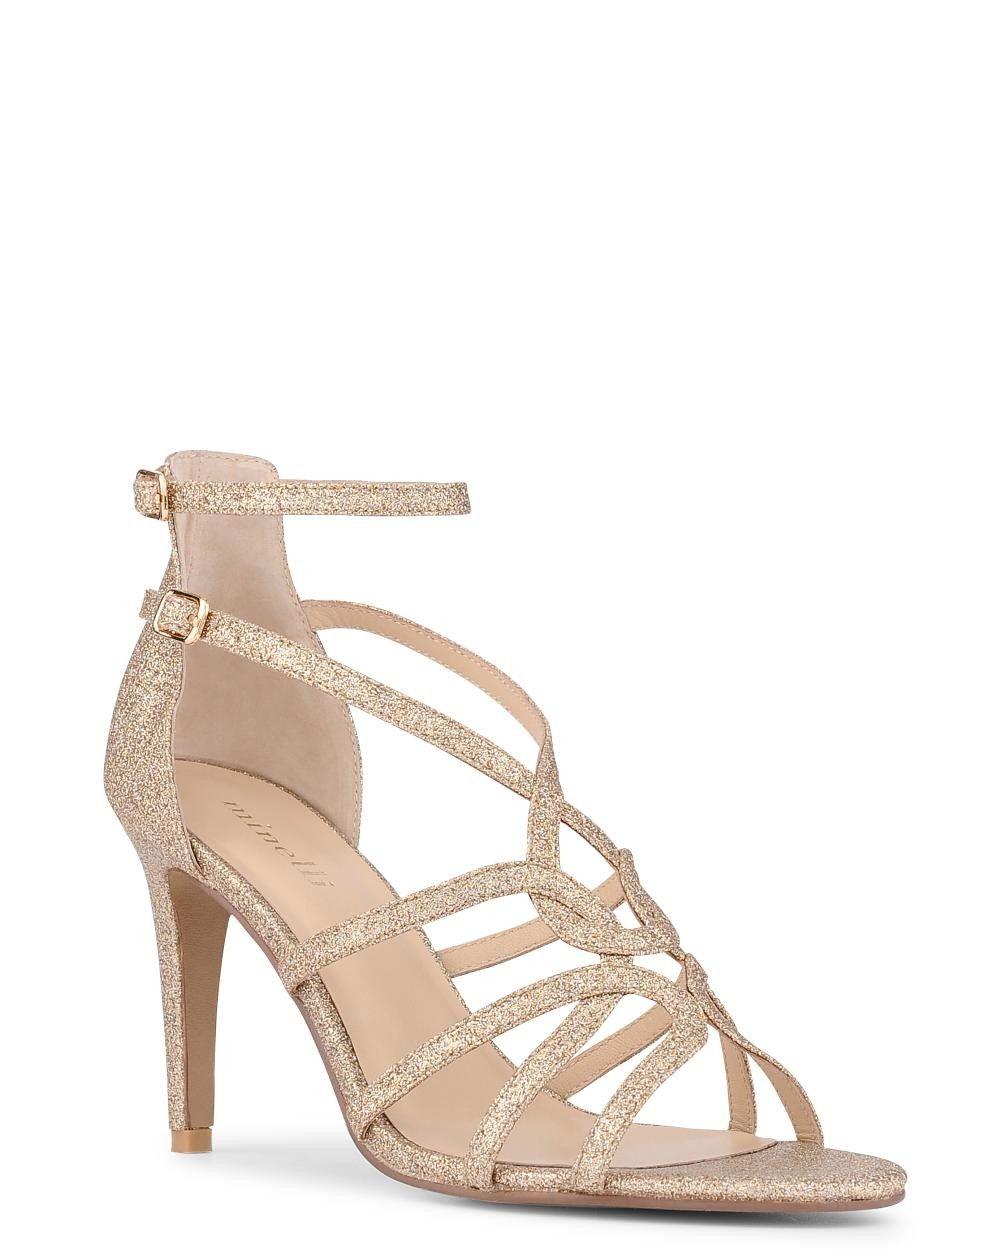 Femme La Collection chaussures Sandale Sandale Mila Or